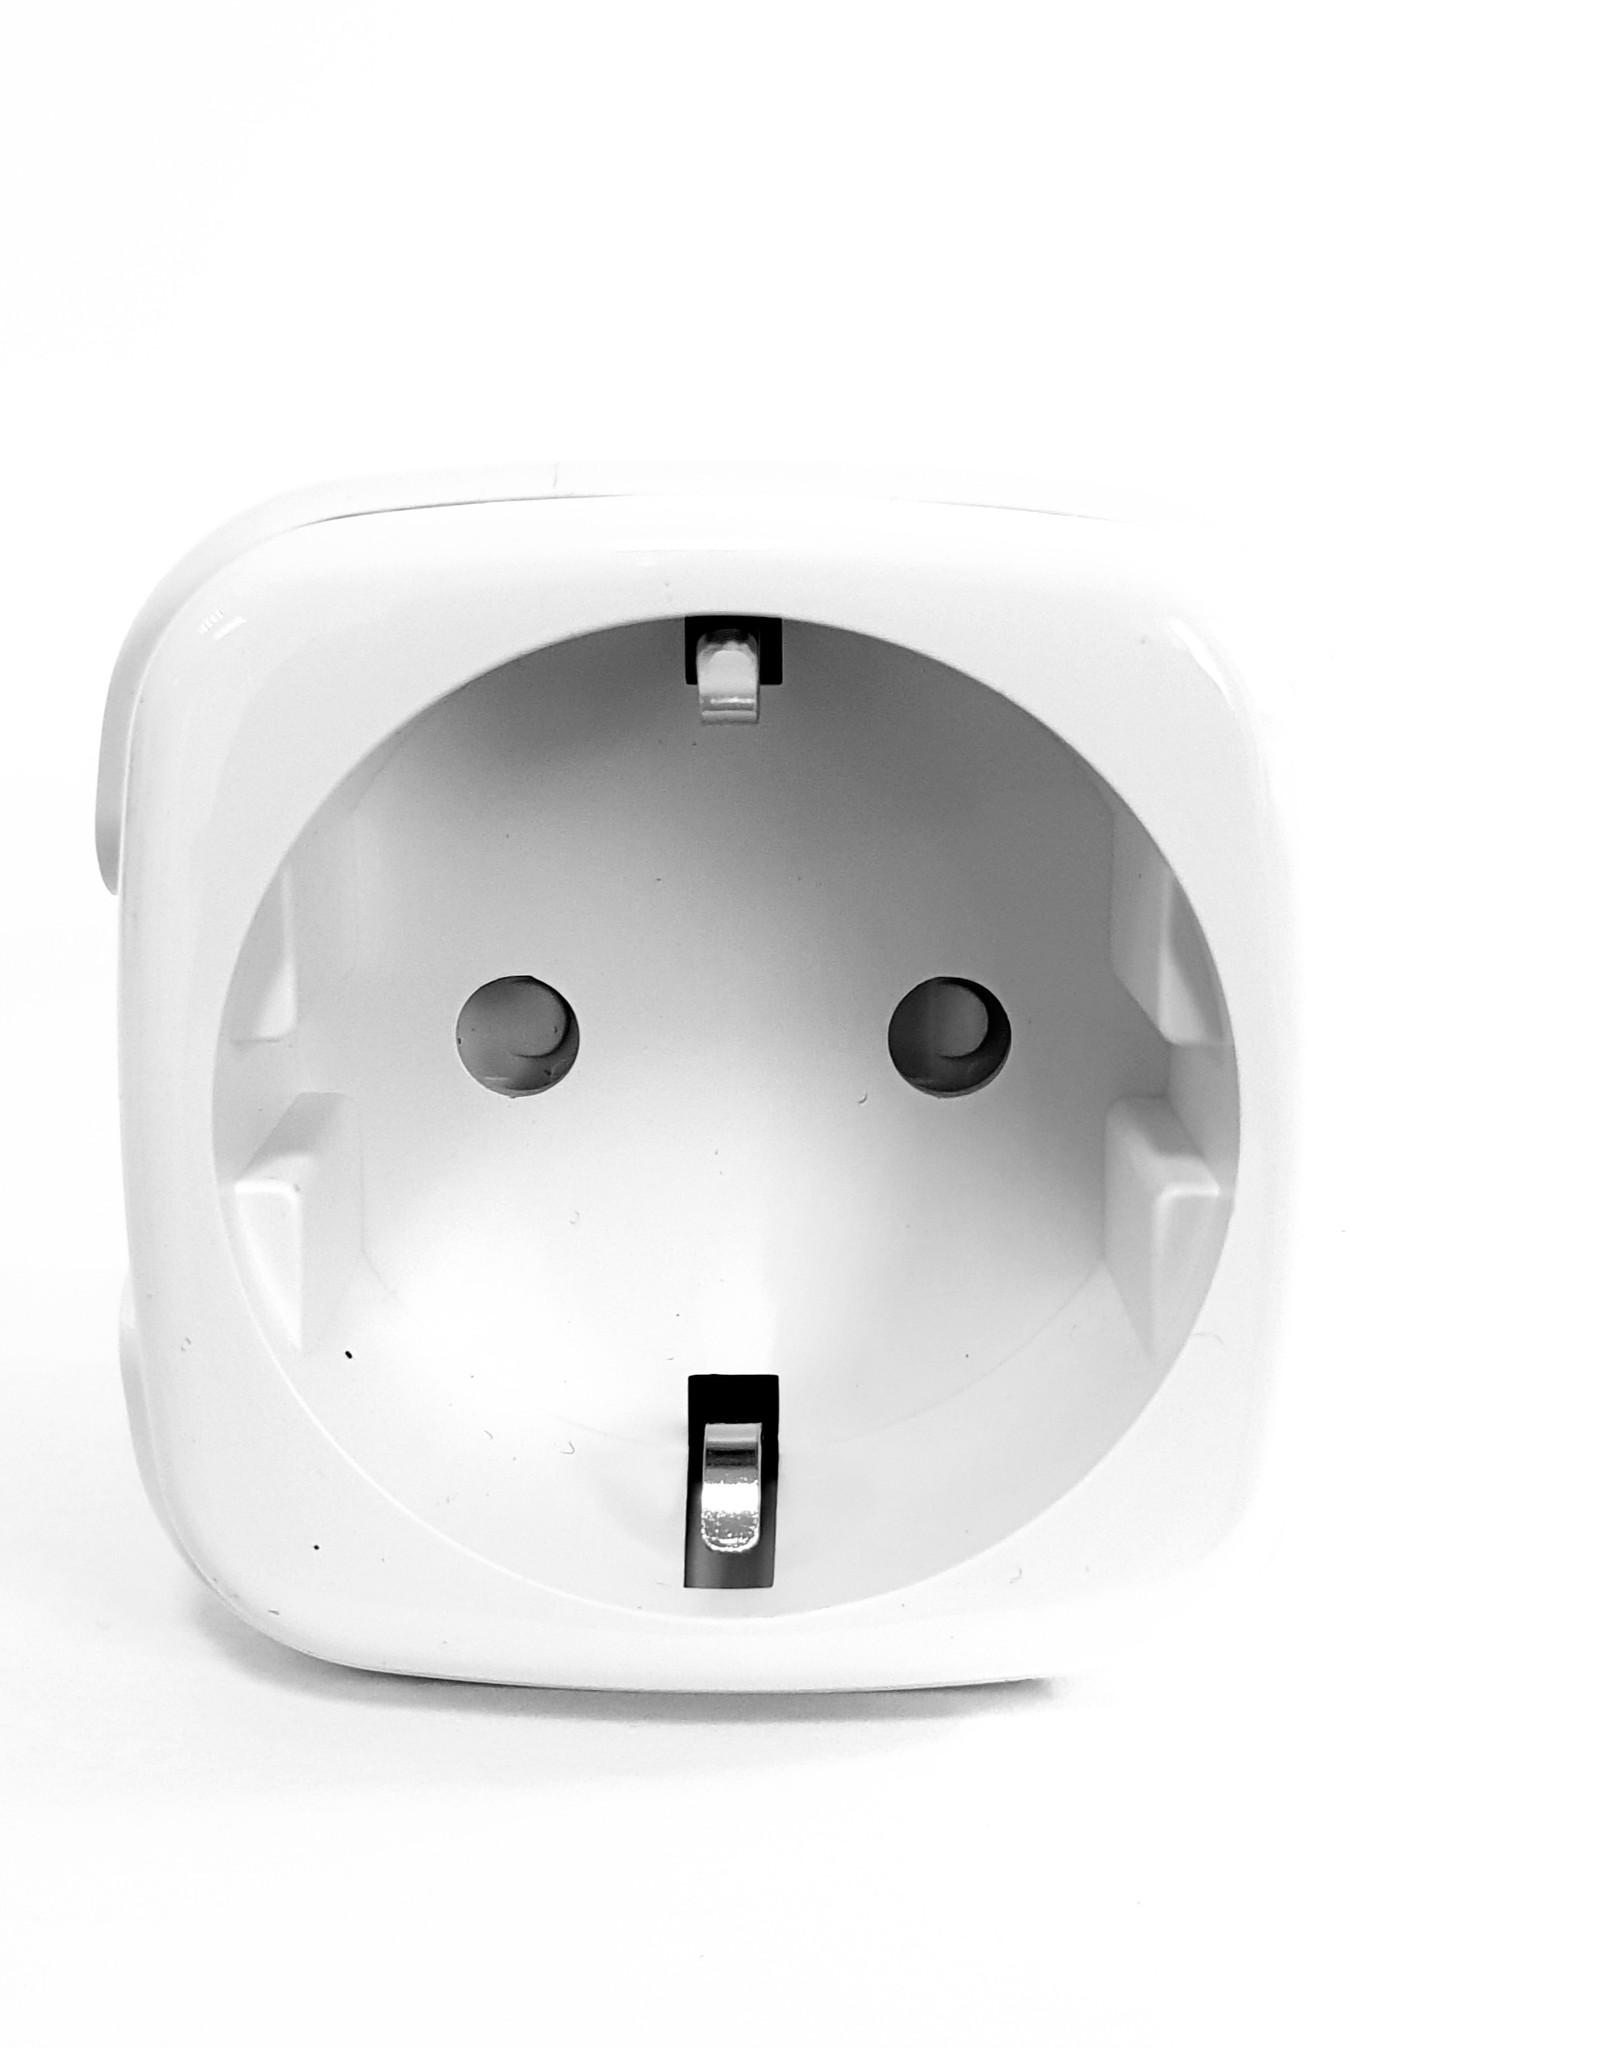 Woox Home 3-pack Woox Smart Home Plugs | R5024